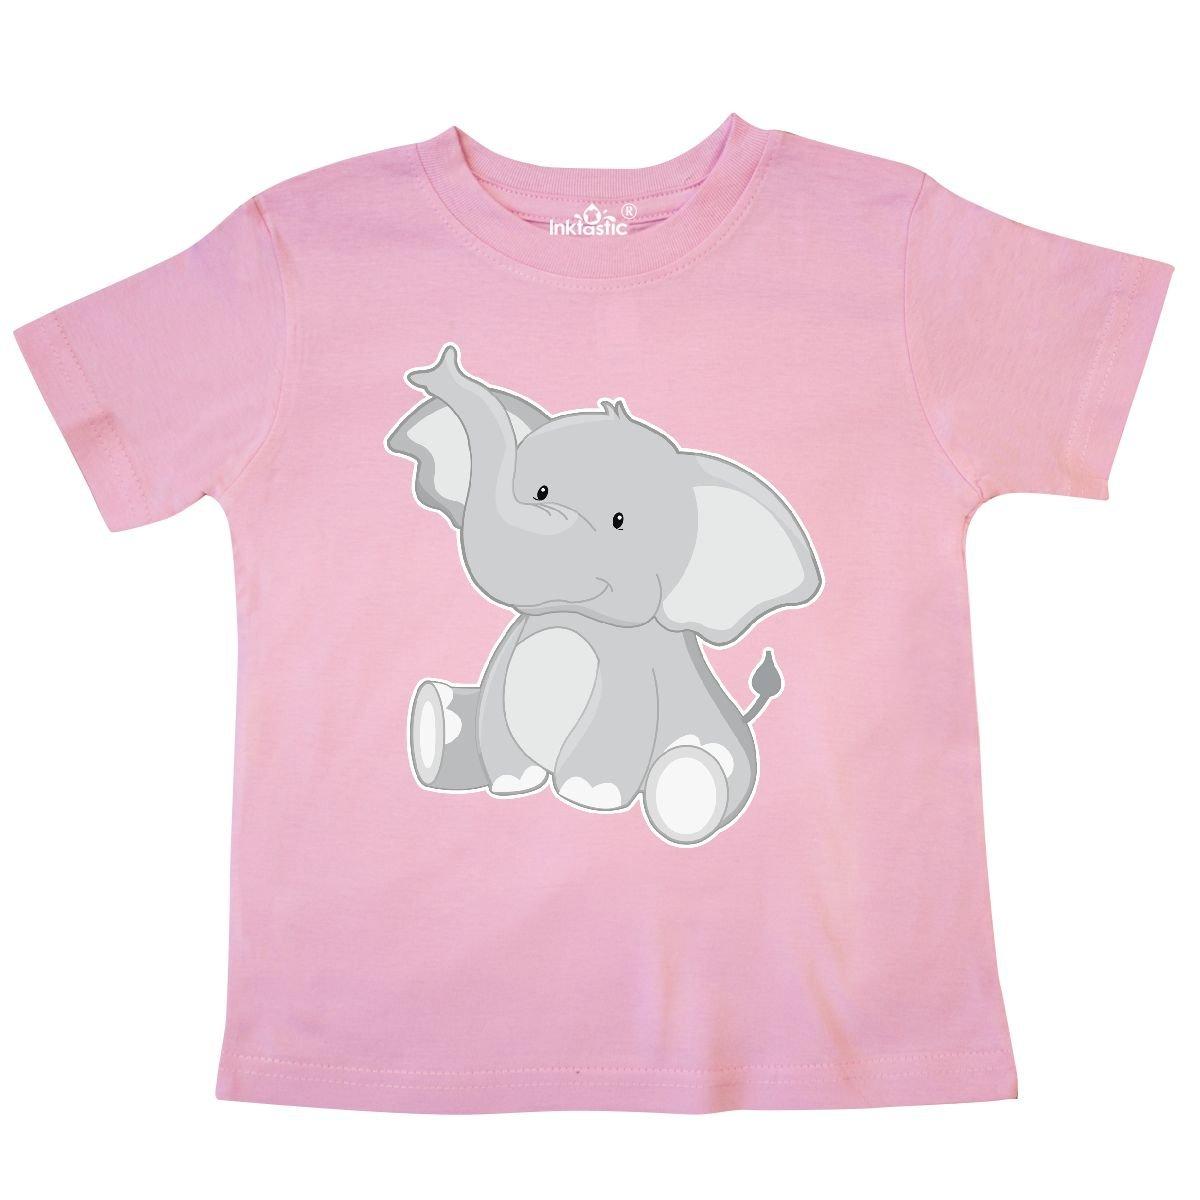 inktastic Elephant Toddler T-Shirt